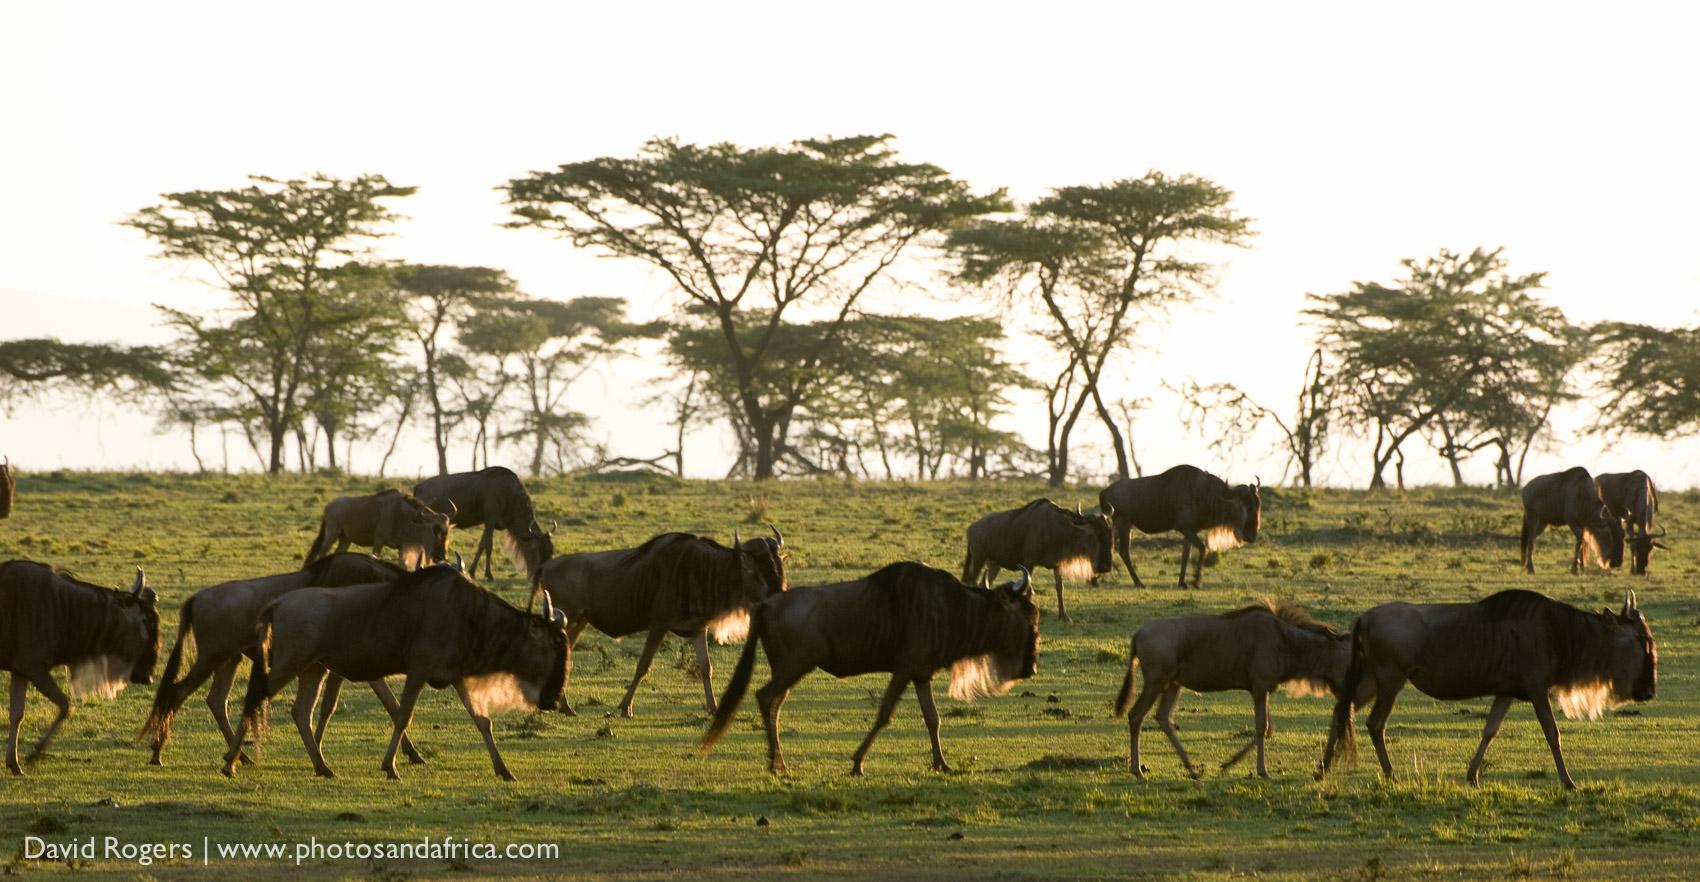 Kenya, Masai Mara National Park, A group of Wildebeest walking in the wild ©David Rogers